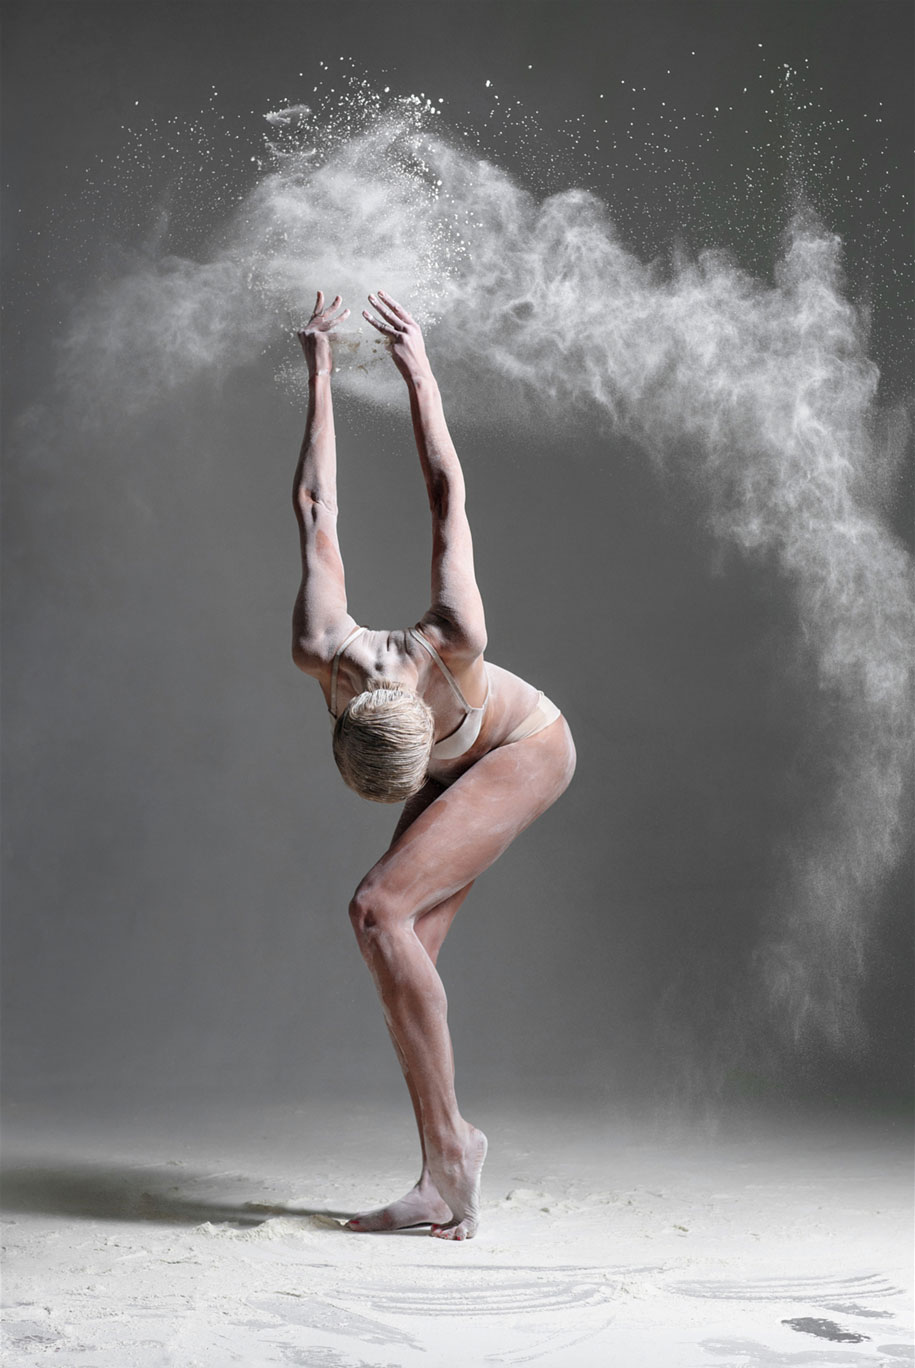 flour-ballet-dancer-photography-portraits-alexander-yakovlev-619